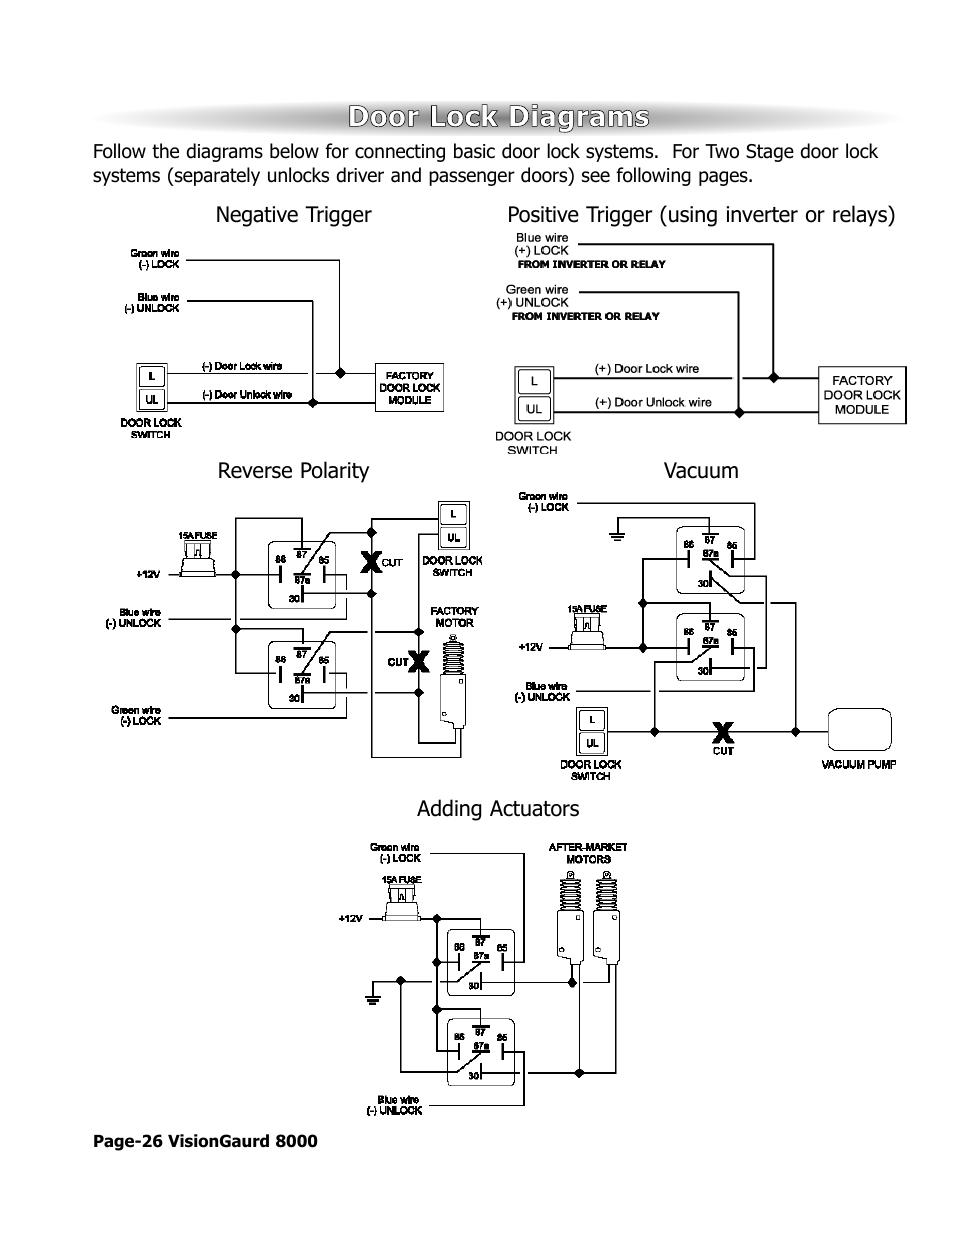 Scytek Door Actuator Wiring   Wiring Diagram on